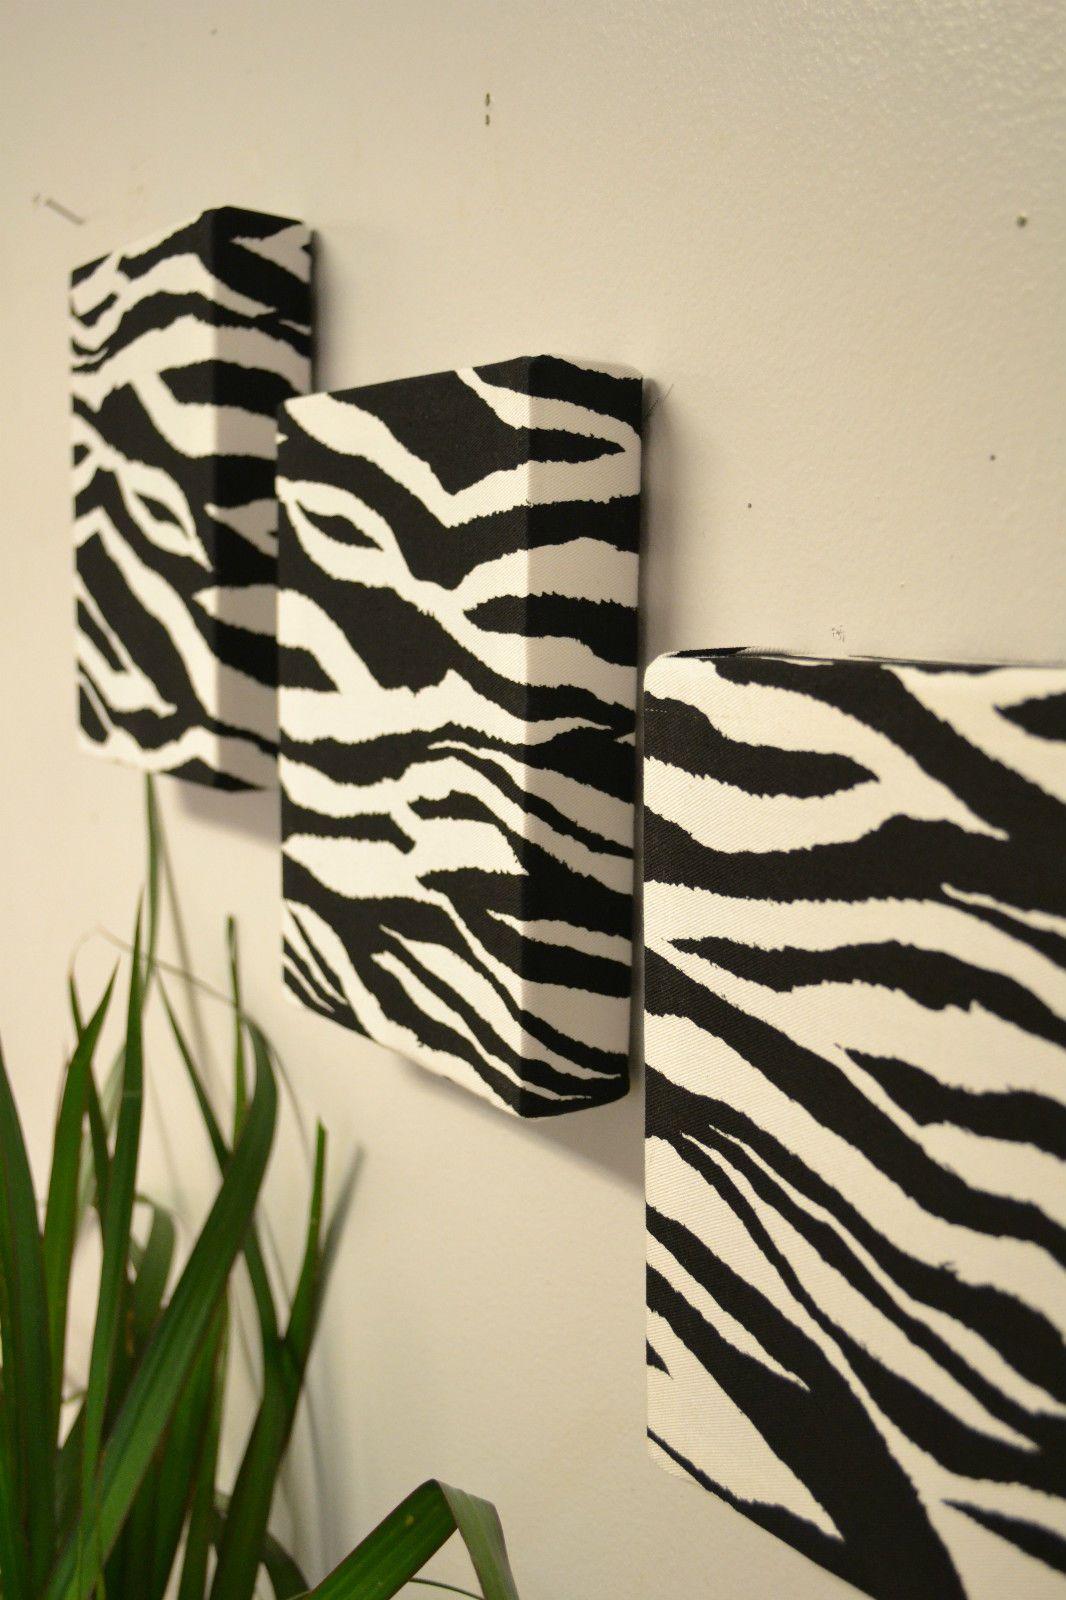 Zebra Print Fabric Wall Hanging Set- Canvas Wall Decor